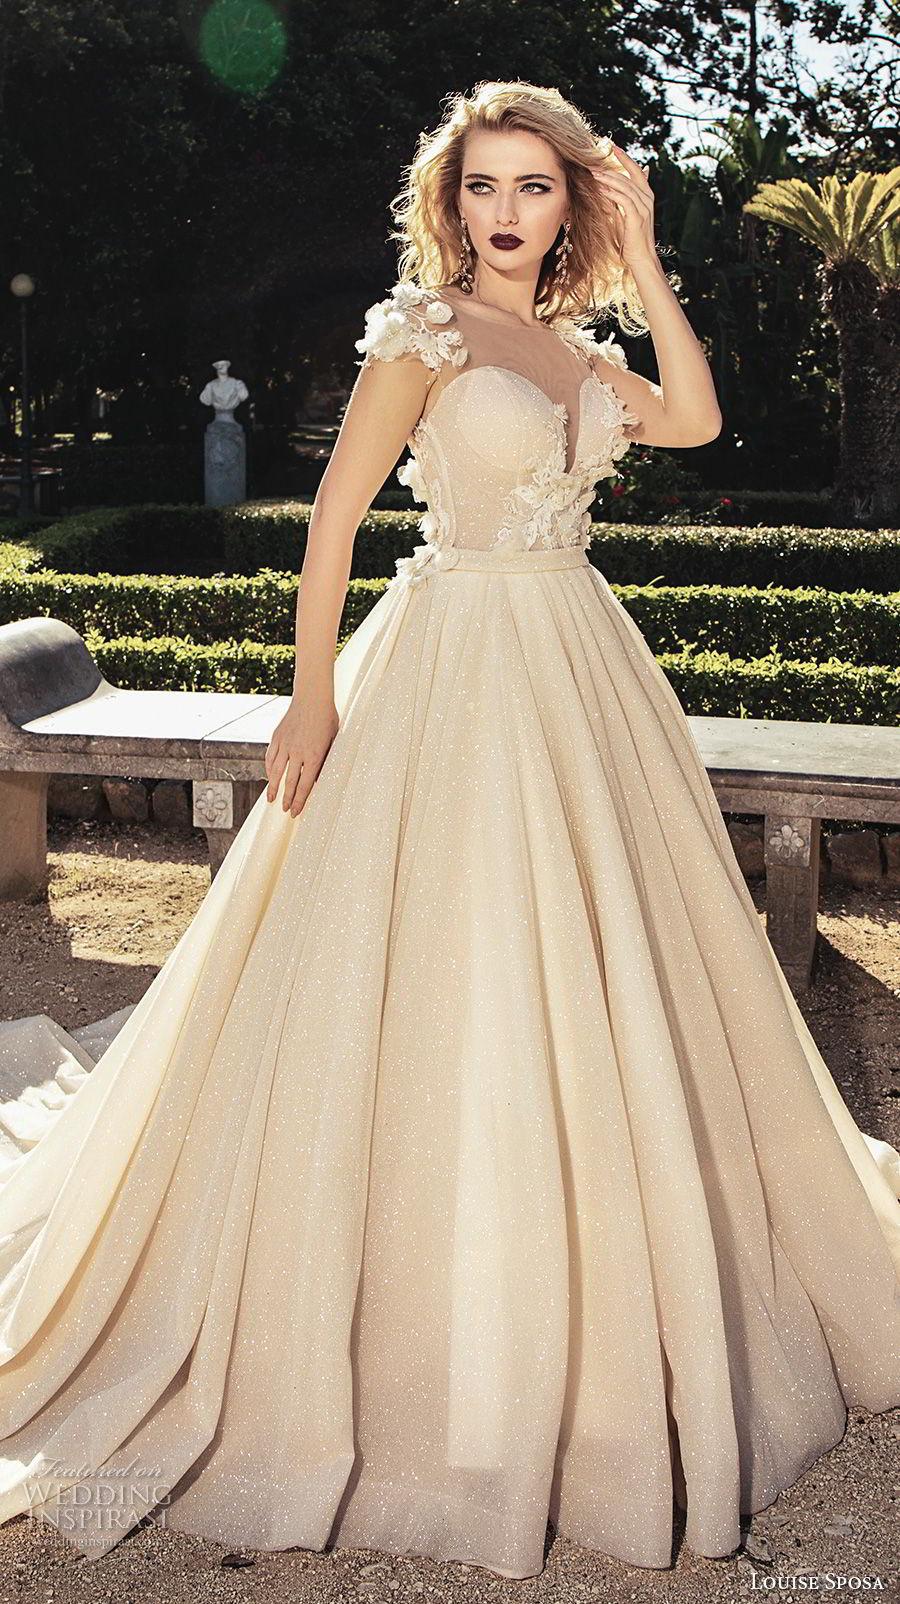 louise sposa 2018 bridal cap sleeves illusion bateau sweetheart neckline heaviy embellished bodice princess champagne color ball gown wedding dress open back royal train (24) mv